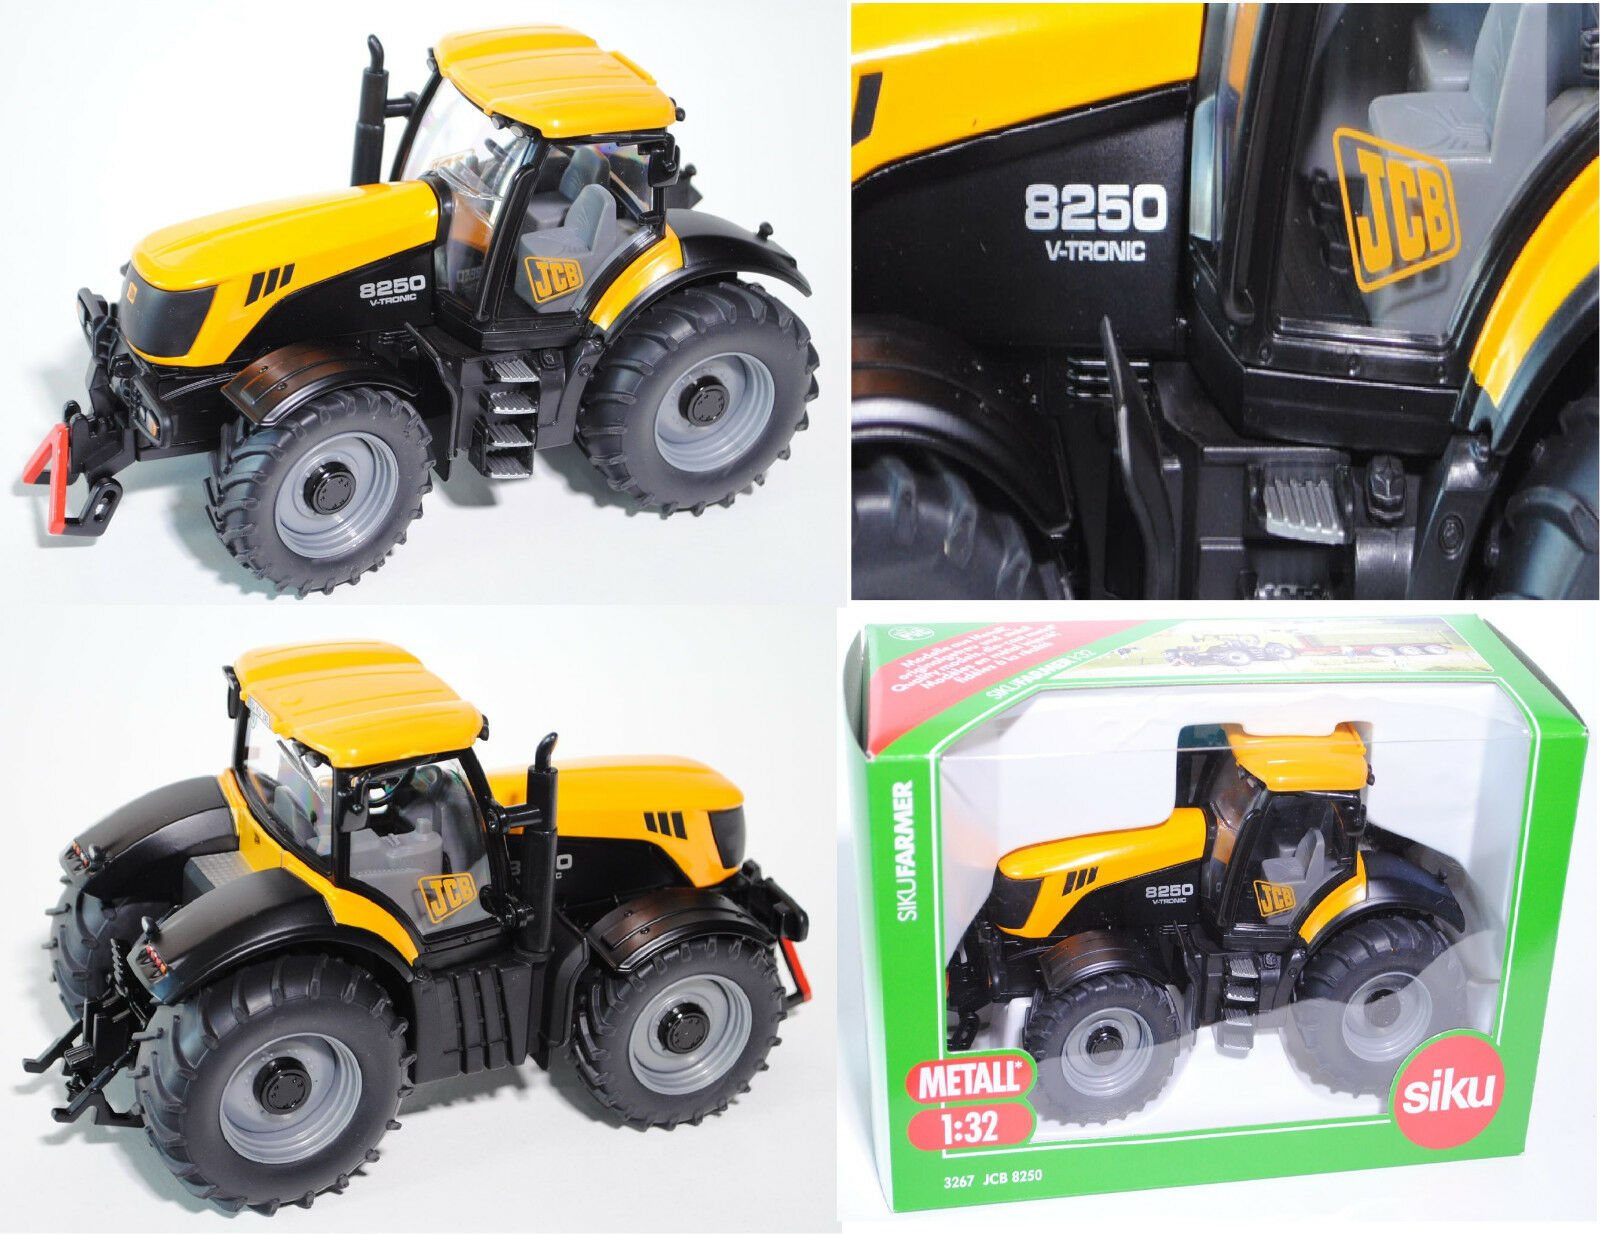 Vuelta de 10 dias Siku Farmer Farmer Farmer 3267 jcb 8250 V-tronic, 1 32  barato y de alta calidad